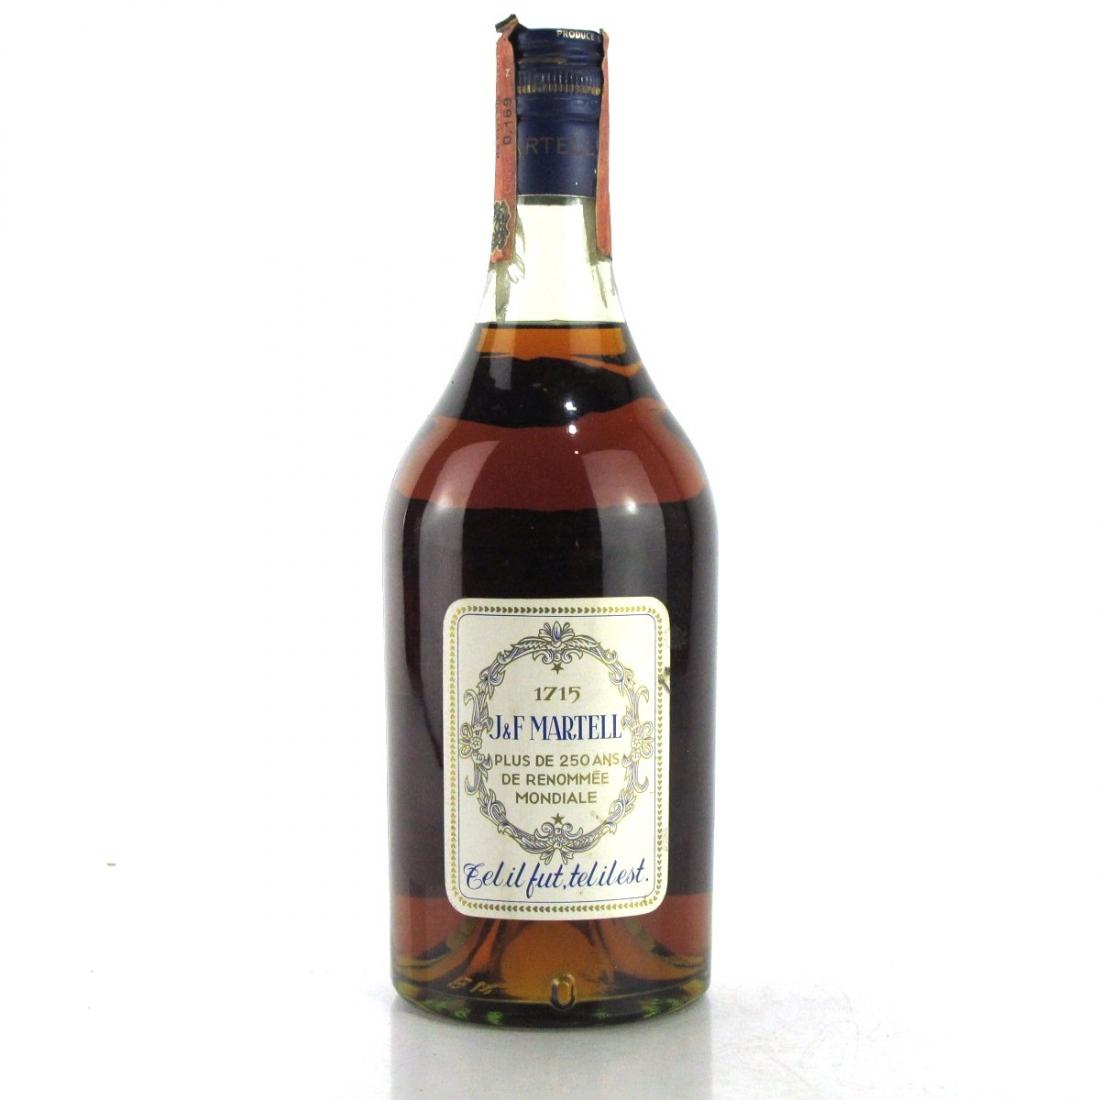 Martell 3-Star Cognac 1970s